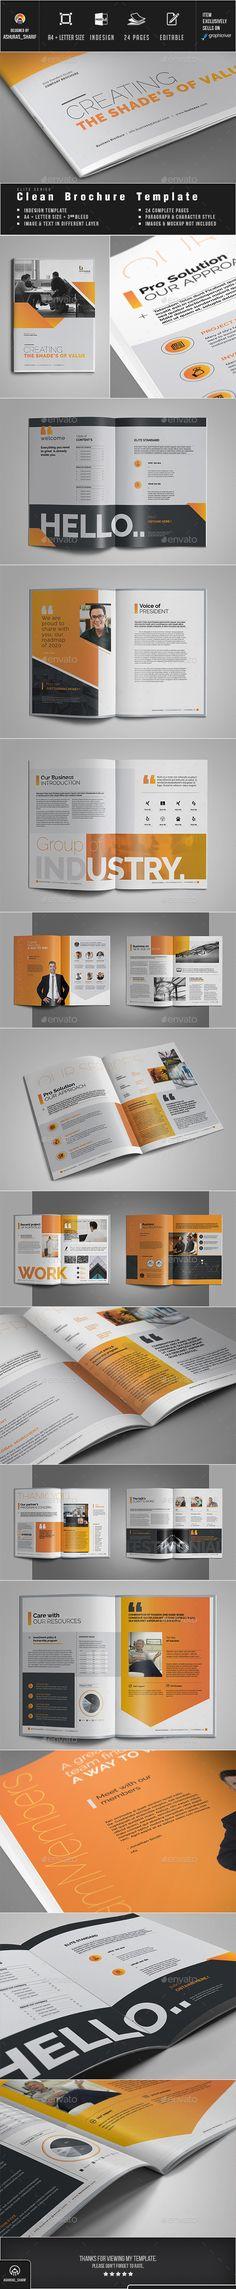 Brochure Travel Brochure Template, Brochure Layout, Corporate Brochure, Business Brochure, Brochure Design, Catalogue Layout, Company Profile Design, Booklet Design, Company Brochure